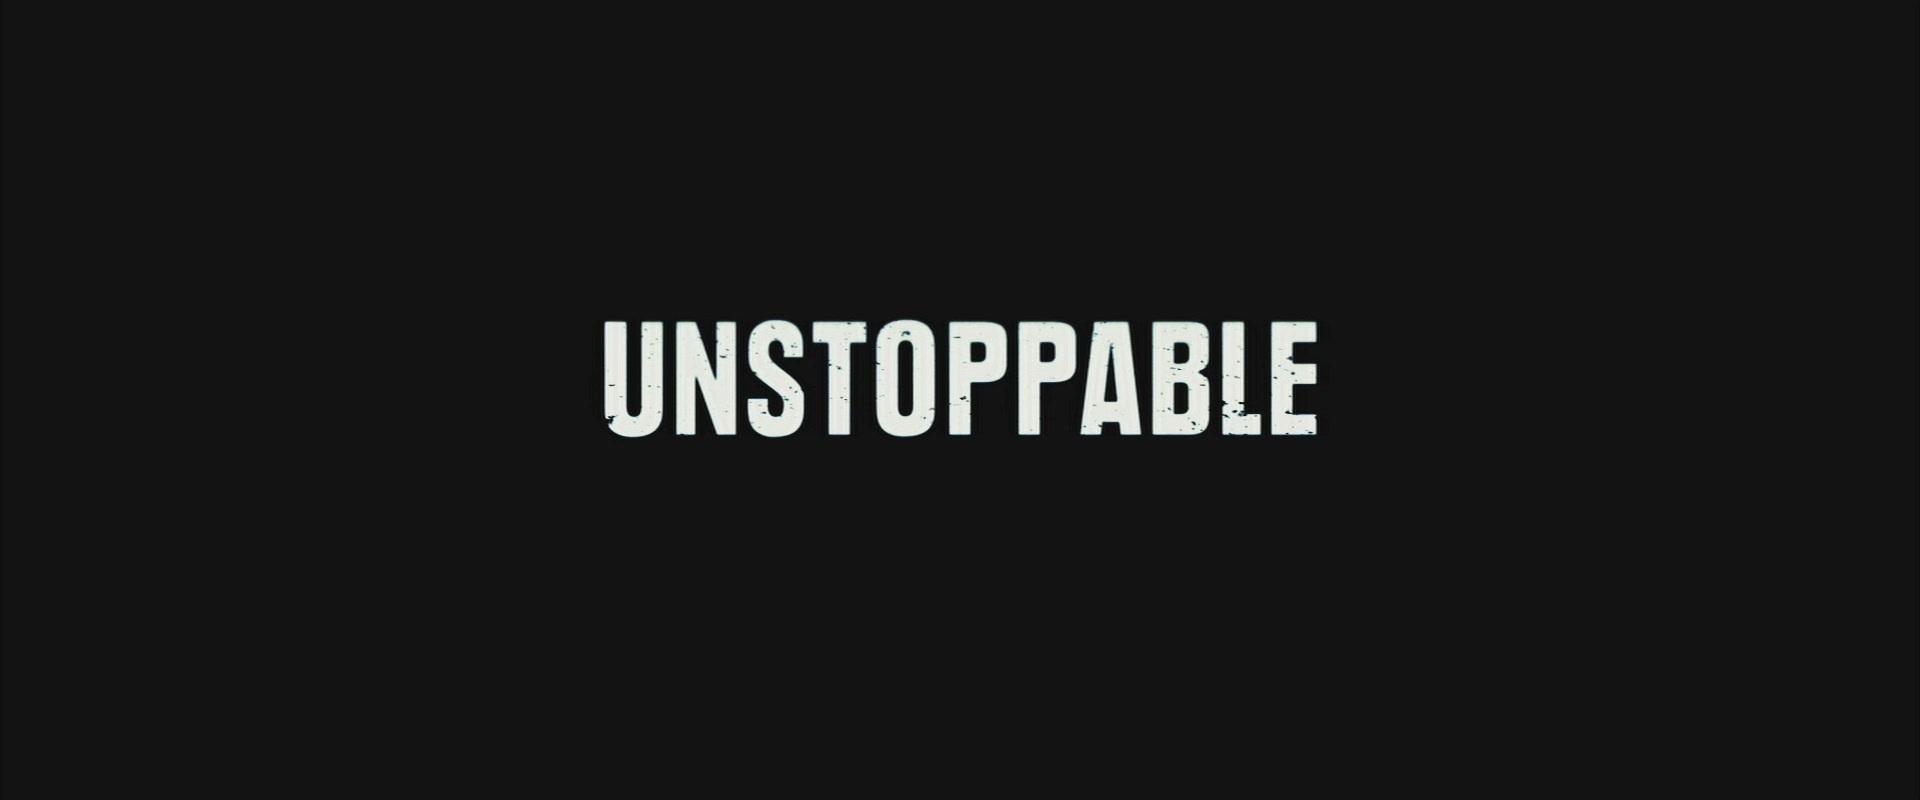 Best 54 Unstoppable Wallpaper on HipWallpaper Unstoppable T Rex 1920x800